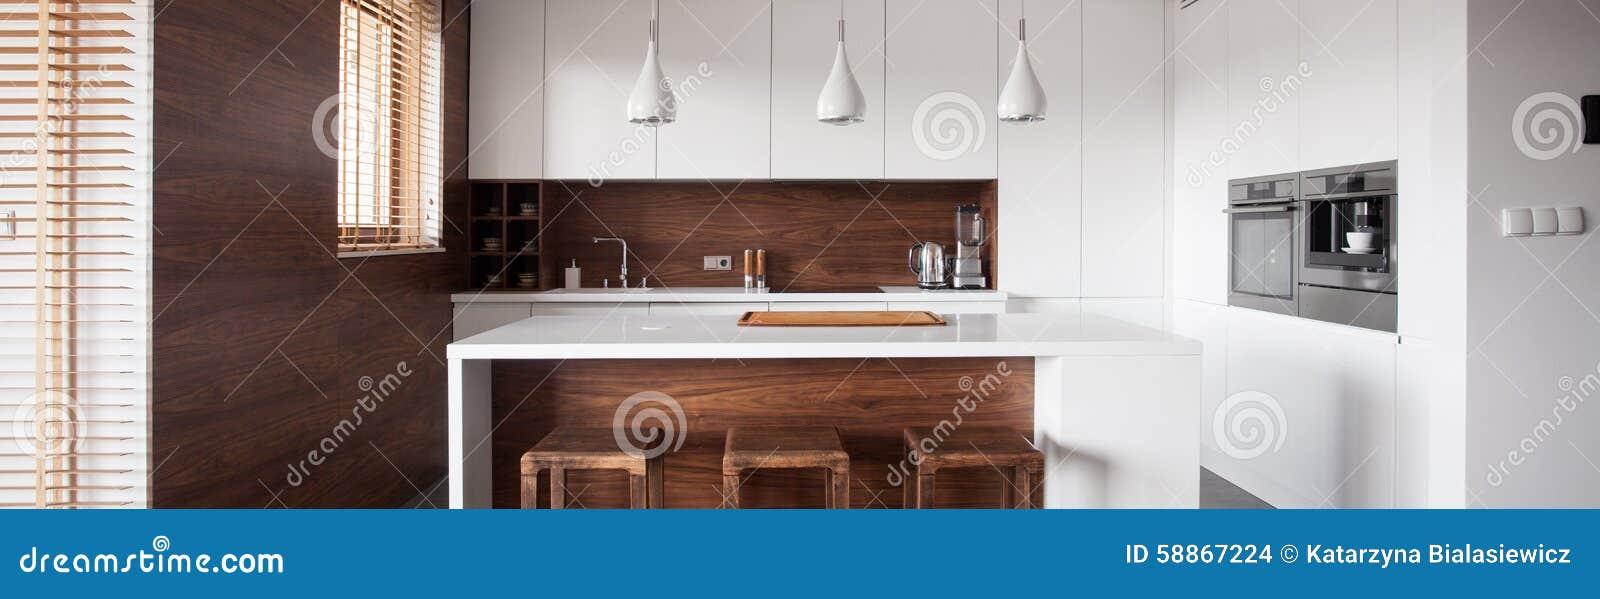 Keukeneiland in houten keuken stock foto   afbeelding: 58867224